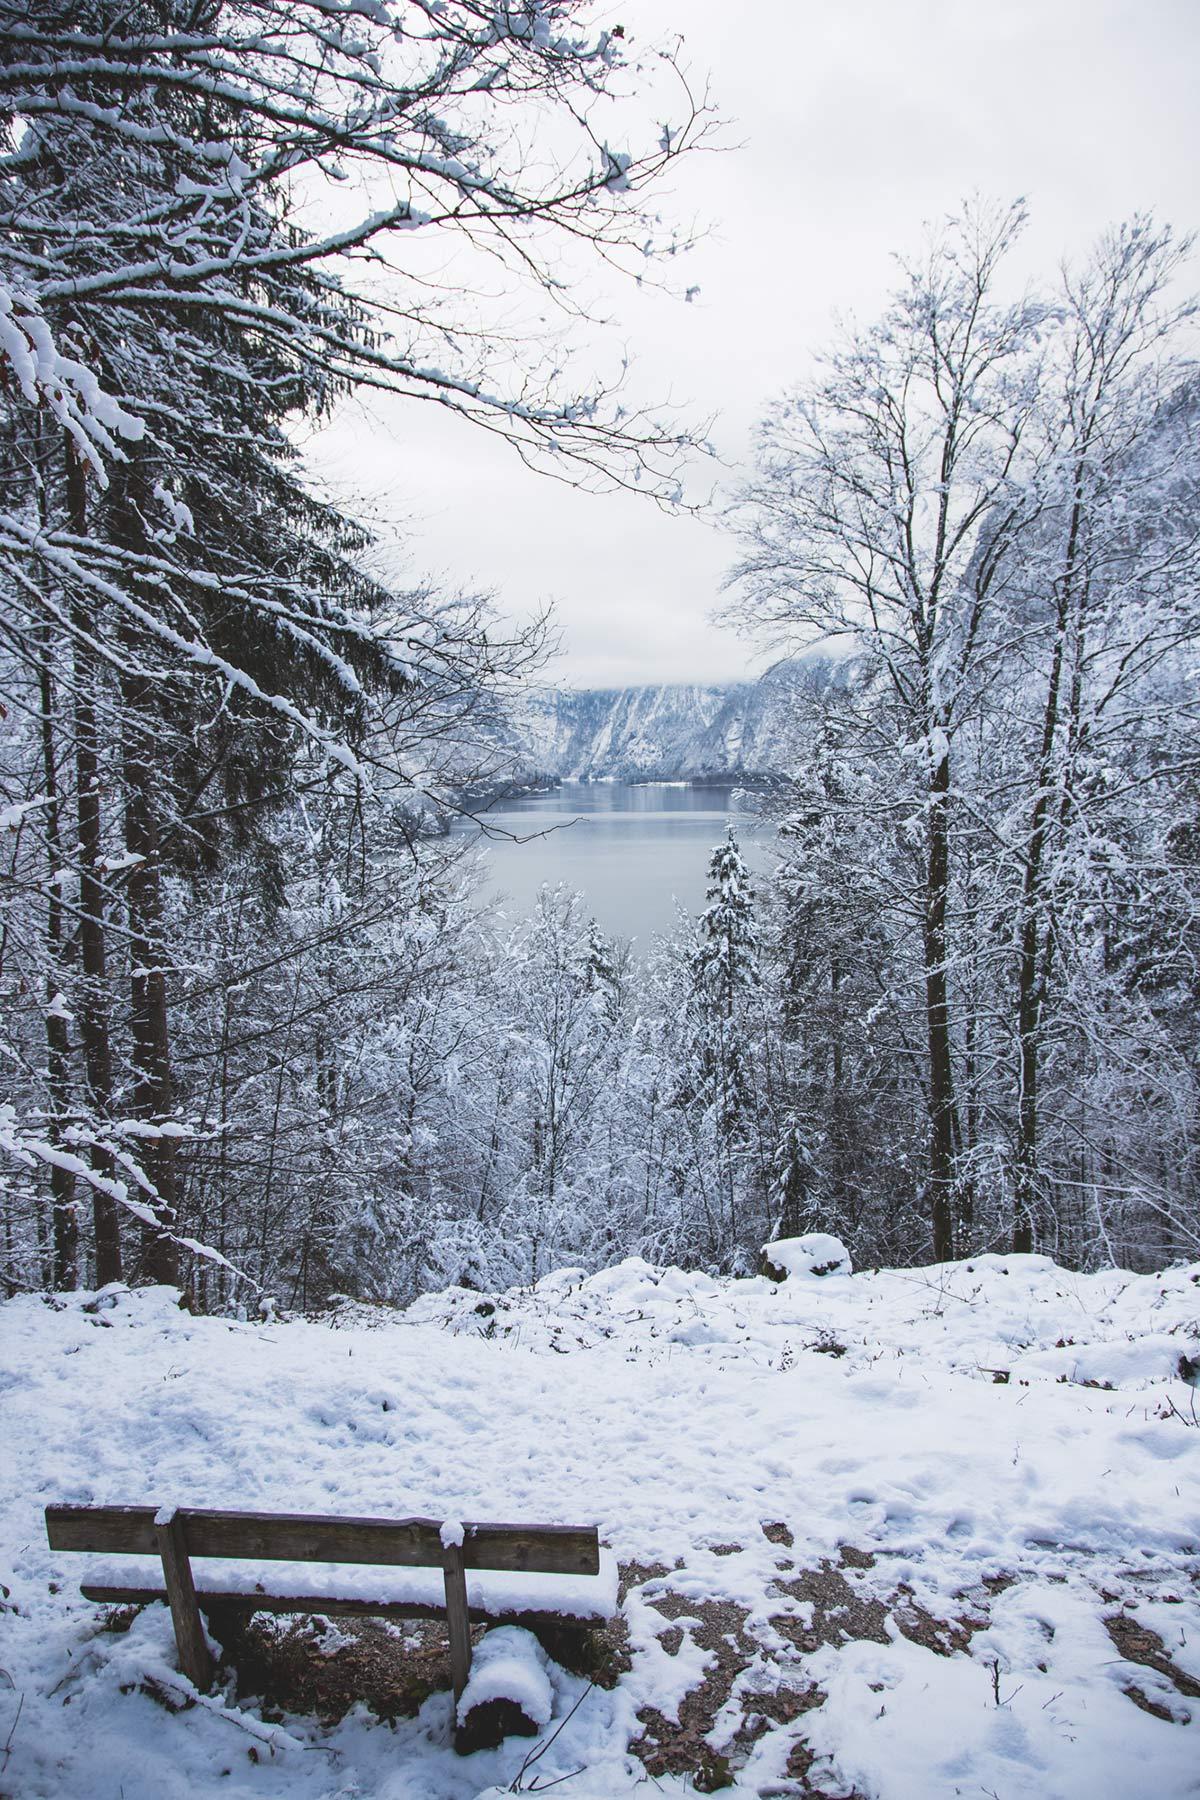 Malerwinkel Berchtesgadener Land Winter